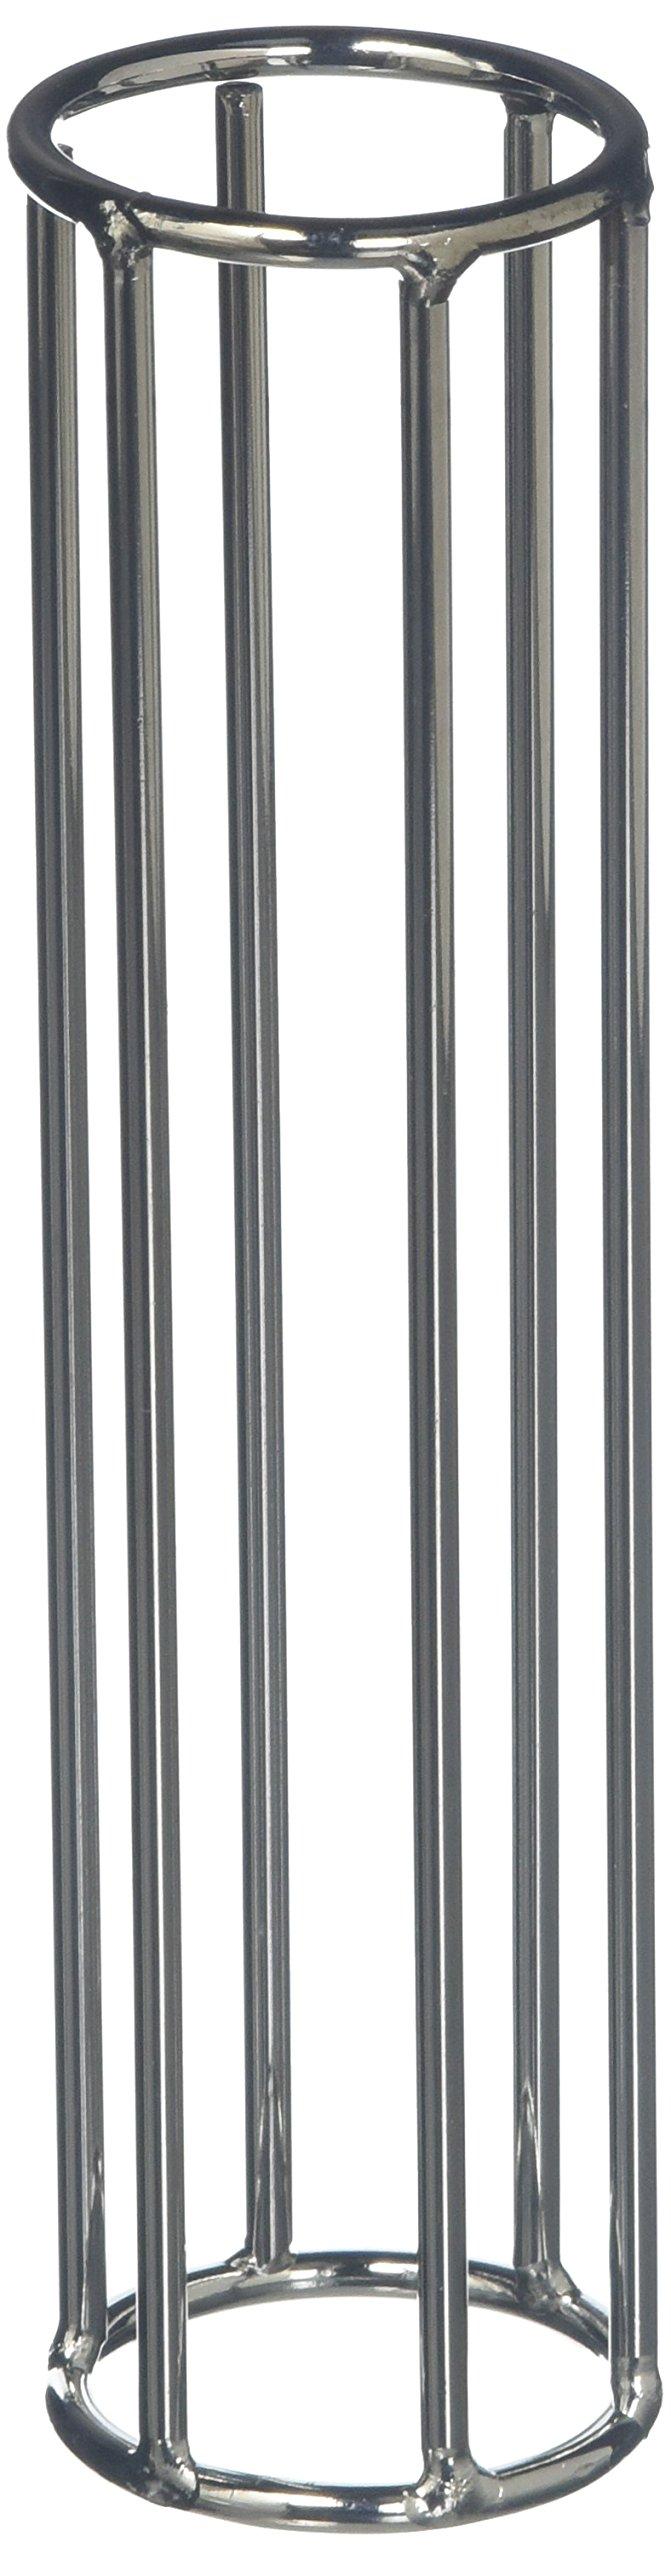 DermaScience Surgitube Tubular Gauze Metal Applicator Cage